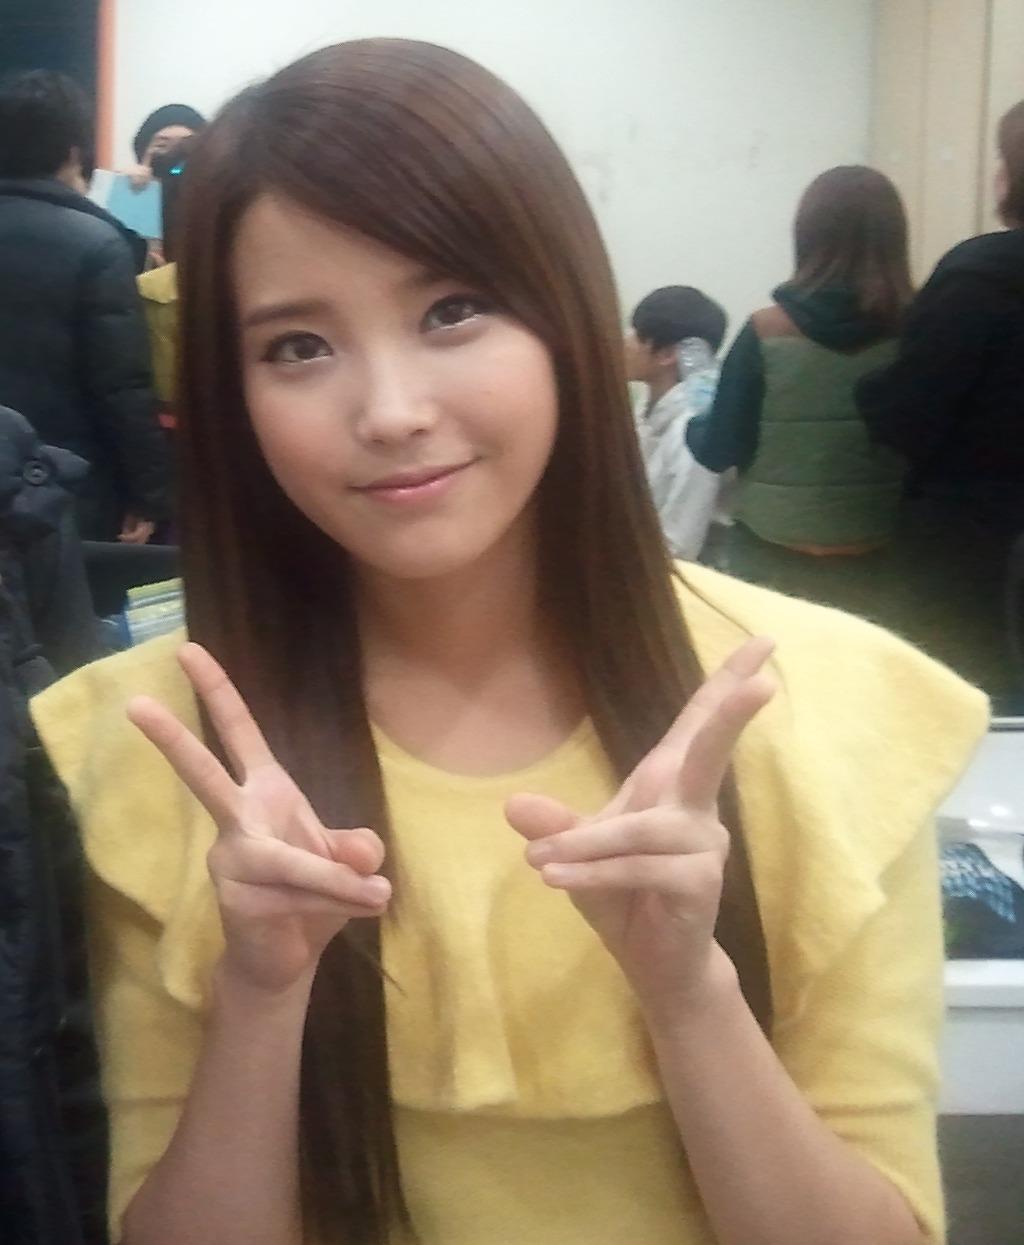 http://3.bp.blogspot.com/-lnRsmHPfGCk/UBzw0DjyVuI/AAAAAAAAEdg/AXnHH_r2Mjk/s1600/IU+Beauty+Smile.jpg